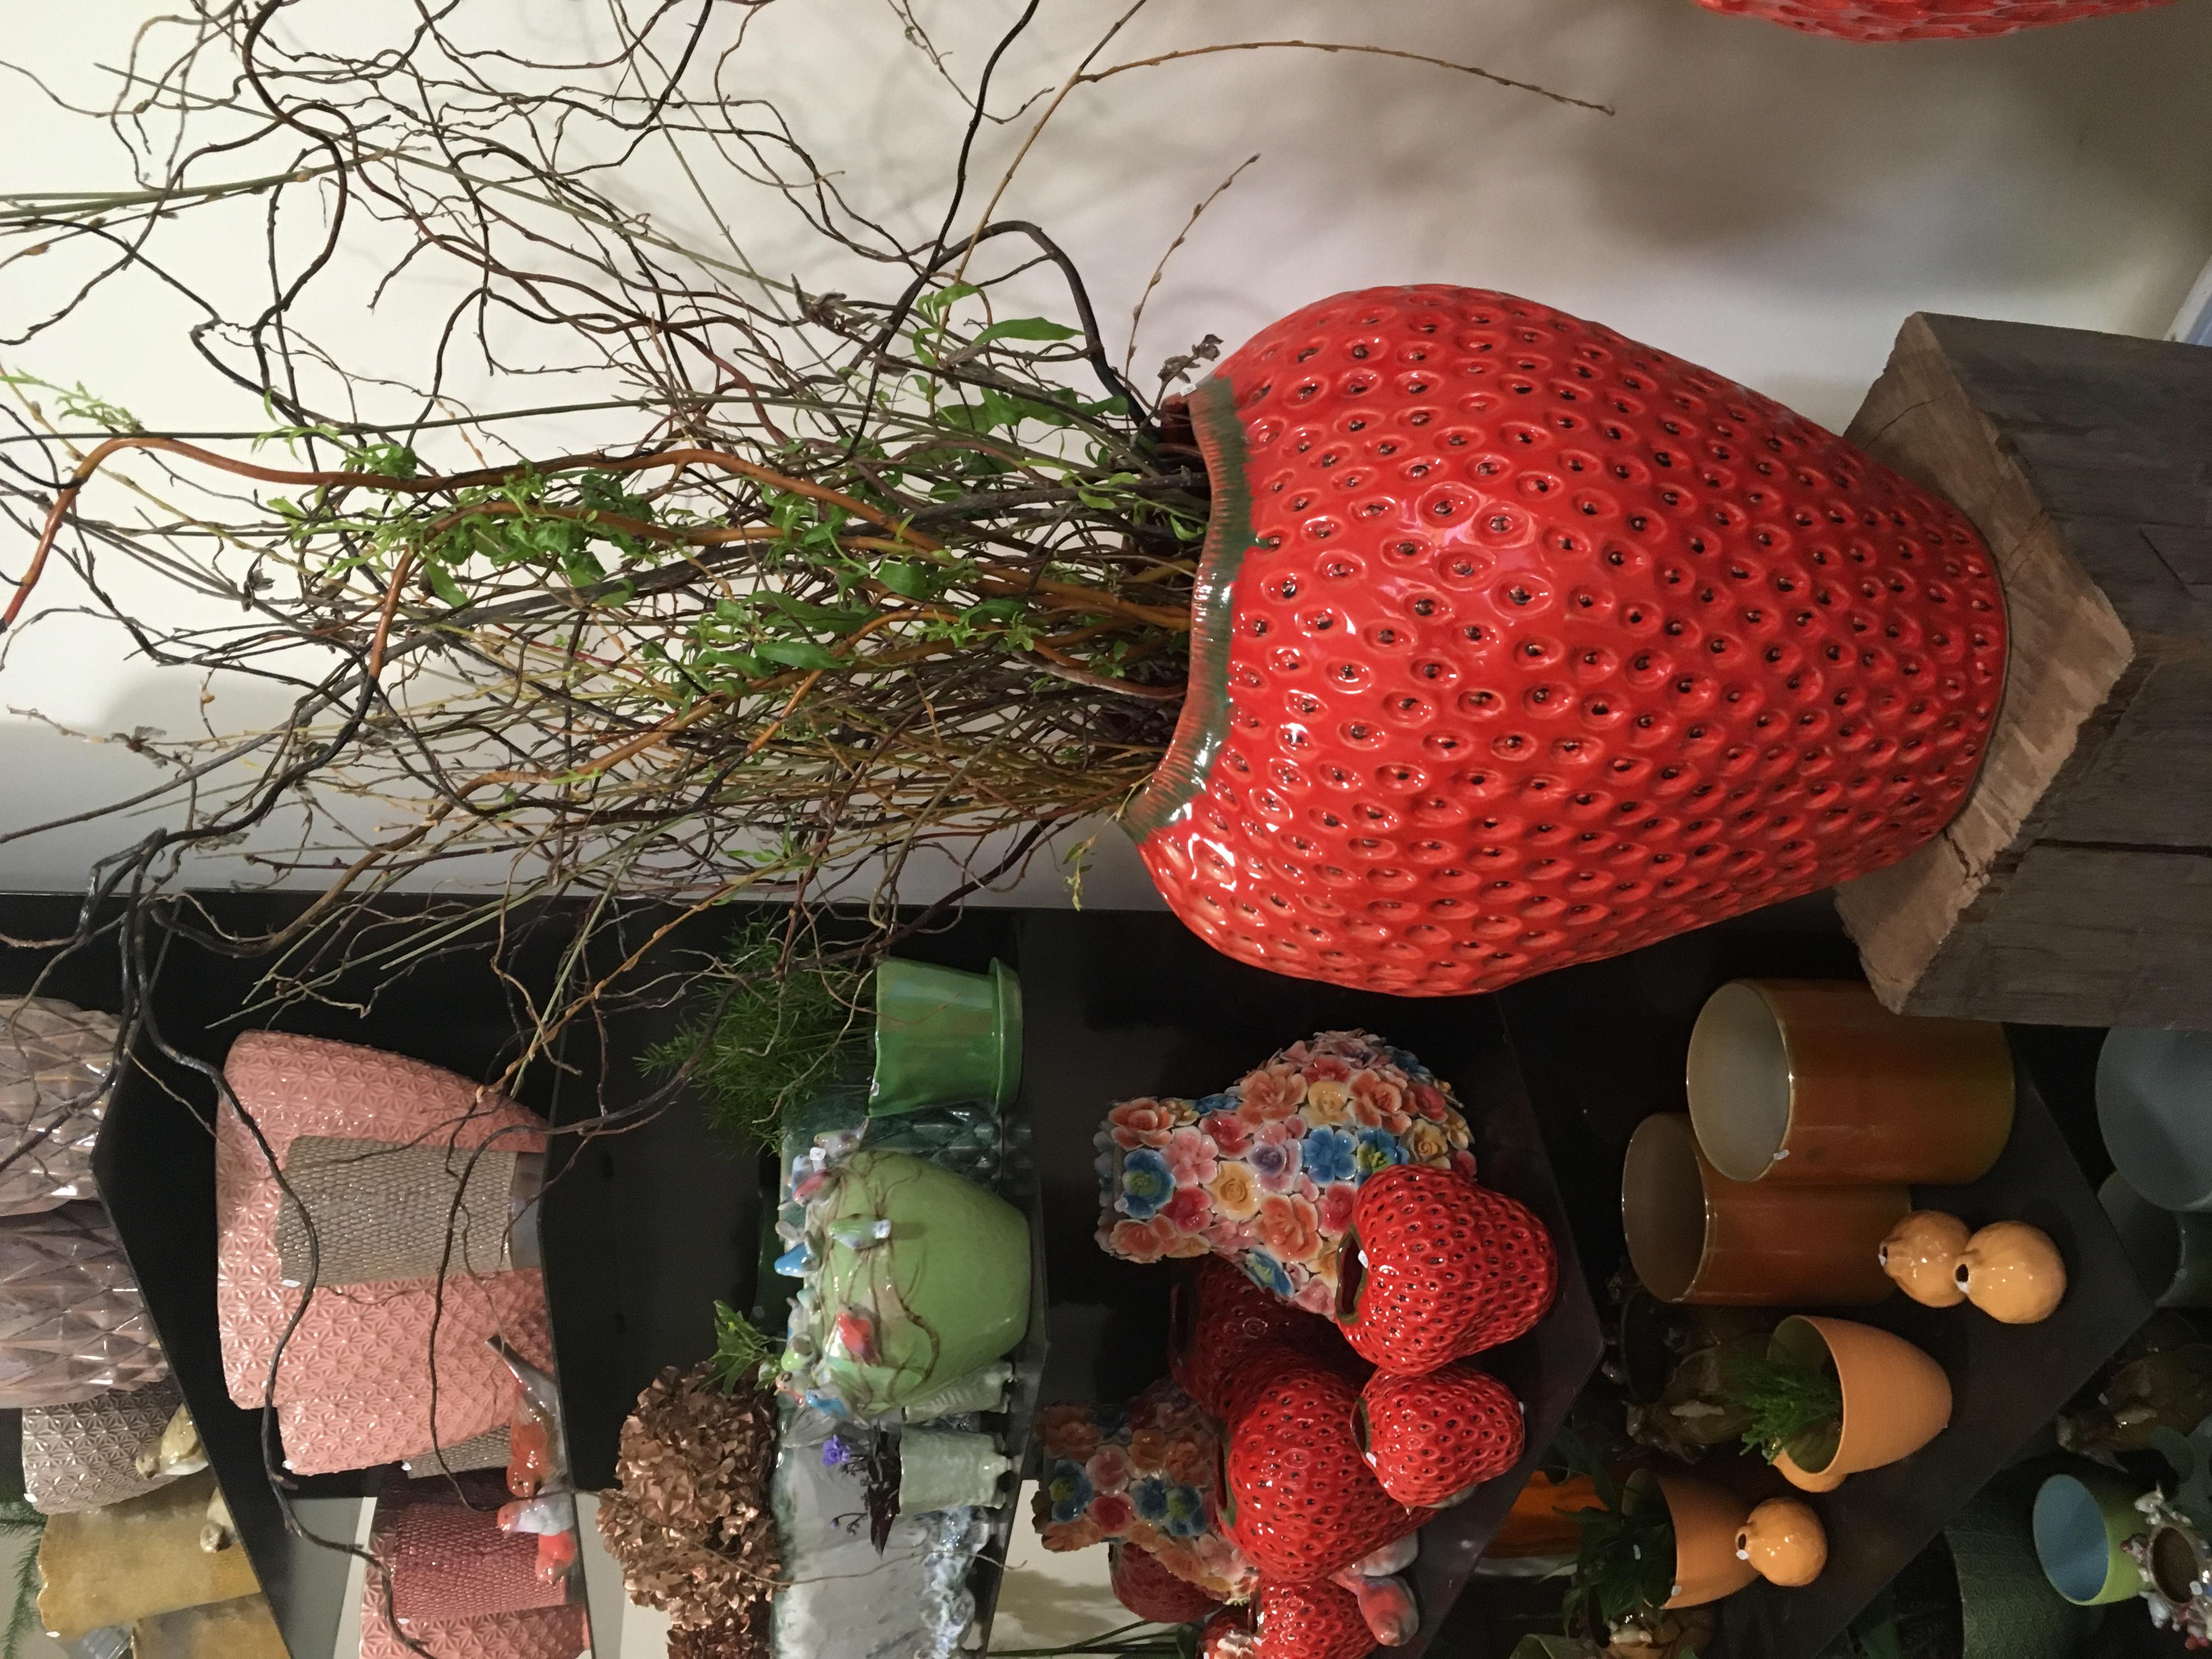 Poteries fraise Marlies Fleurs fleuriste Nimes